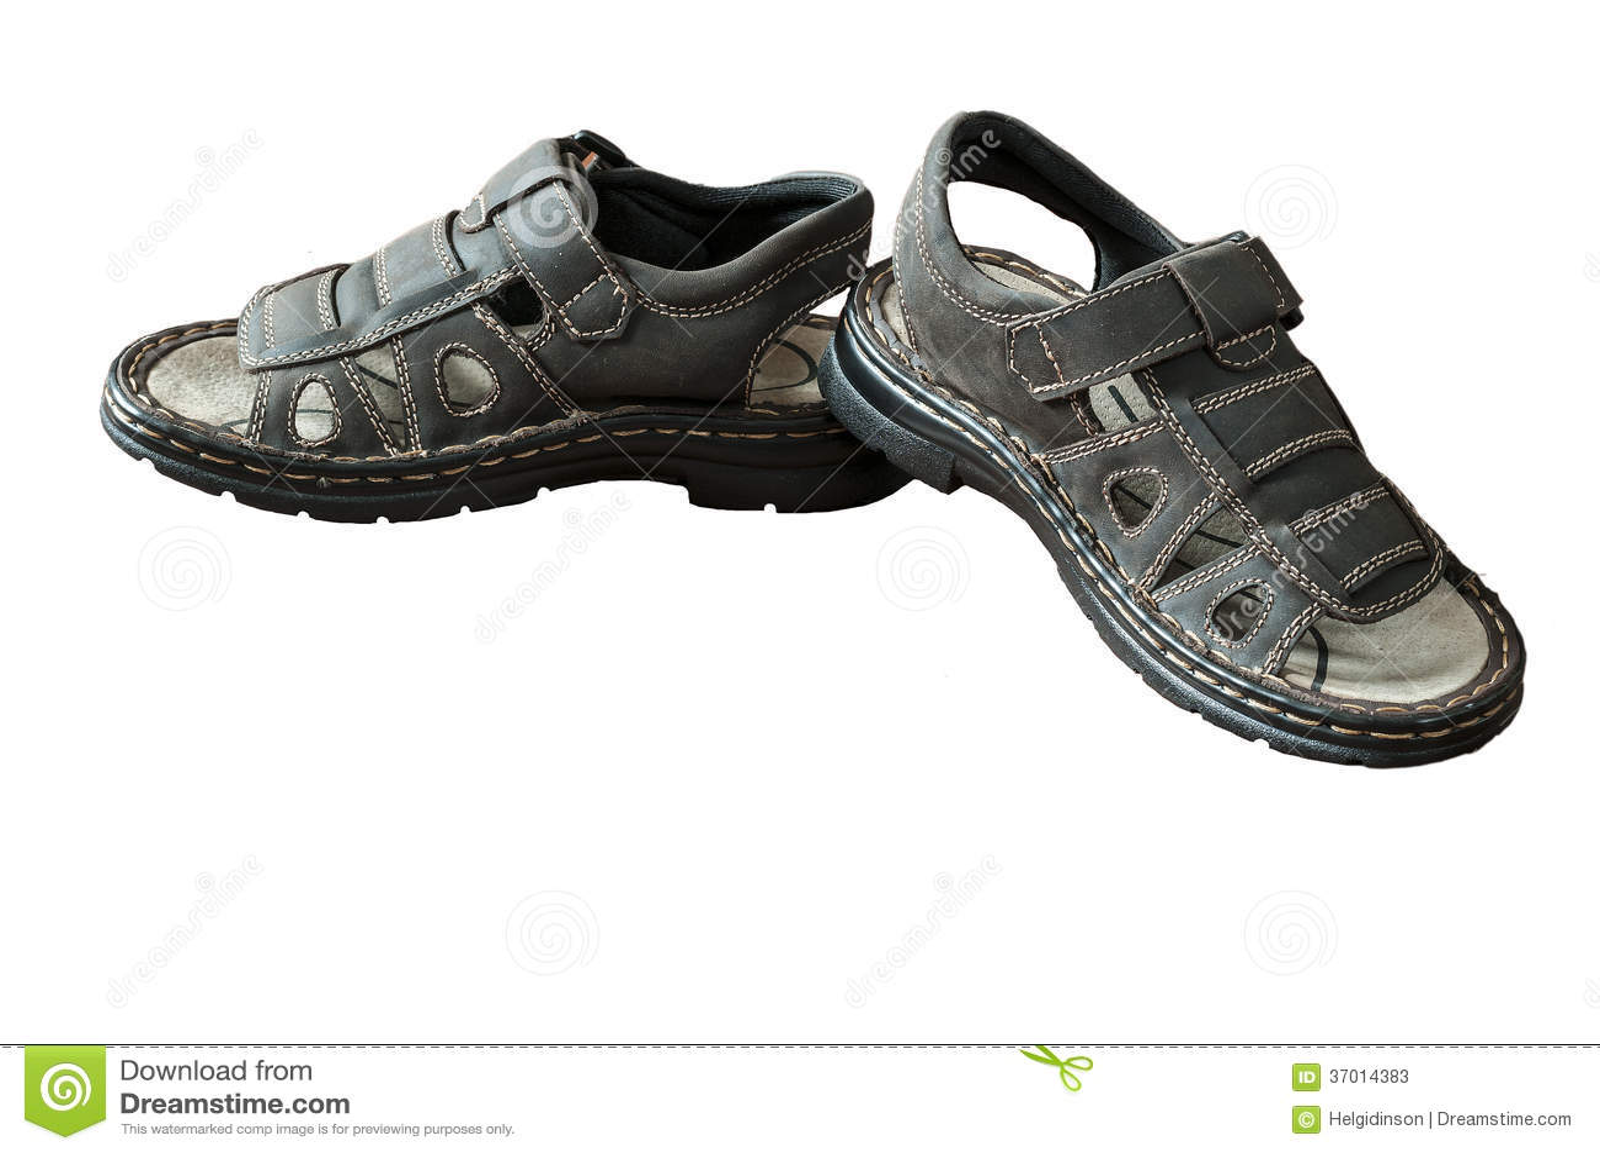 Best Spring Walking Shoes